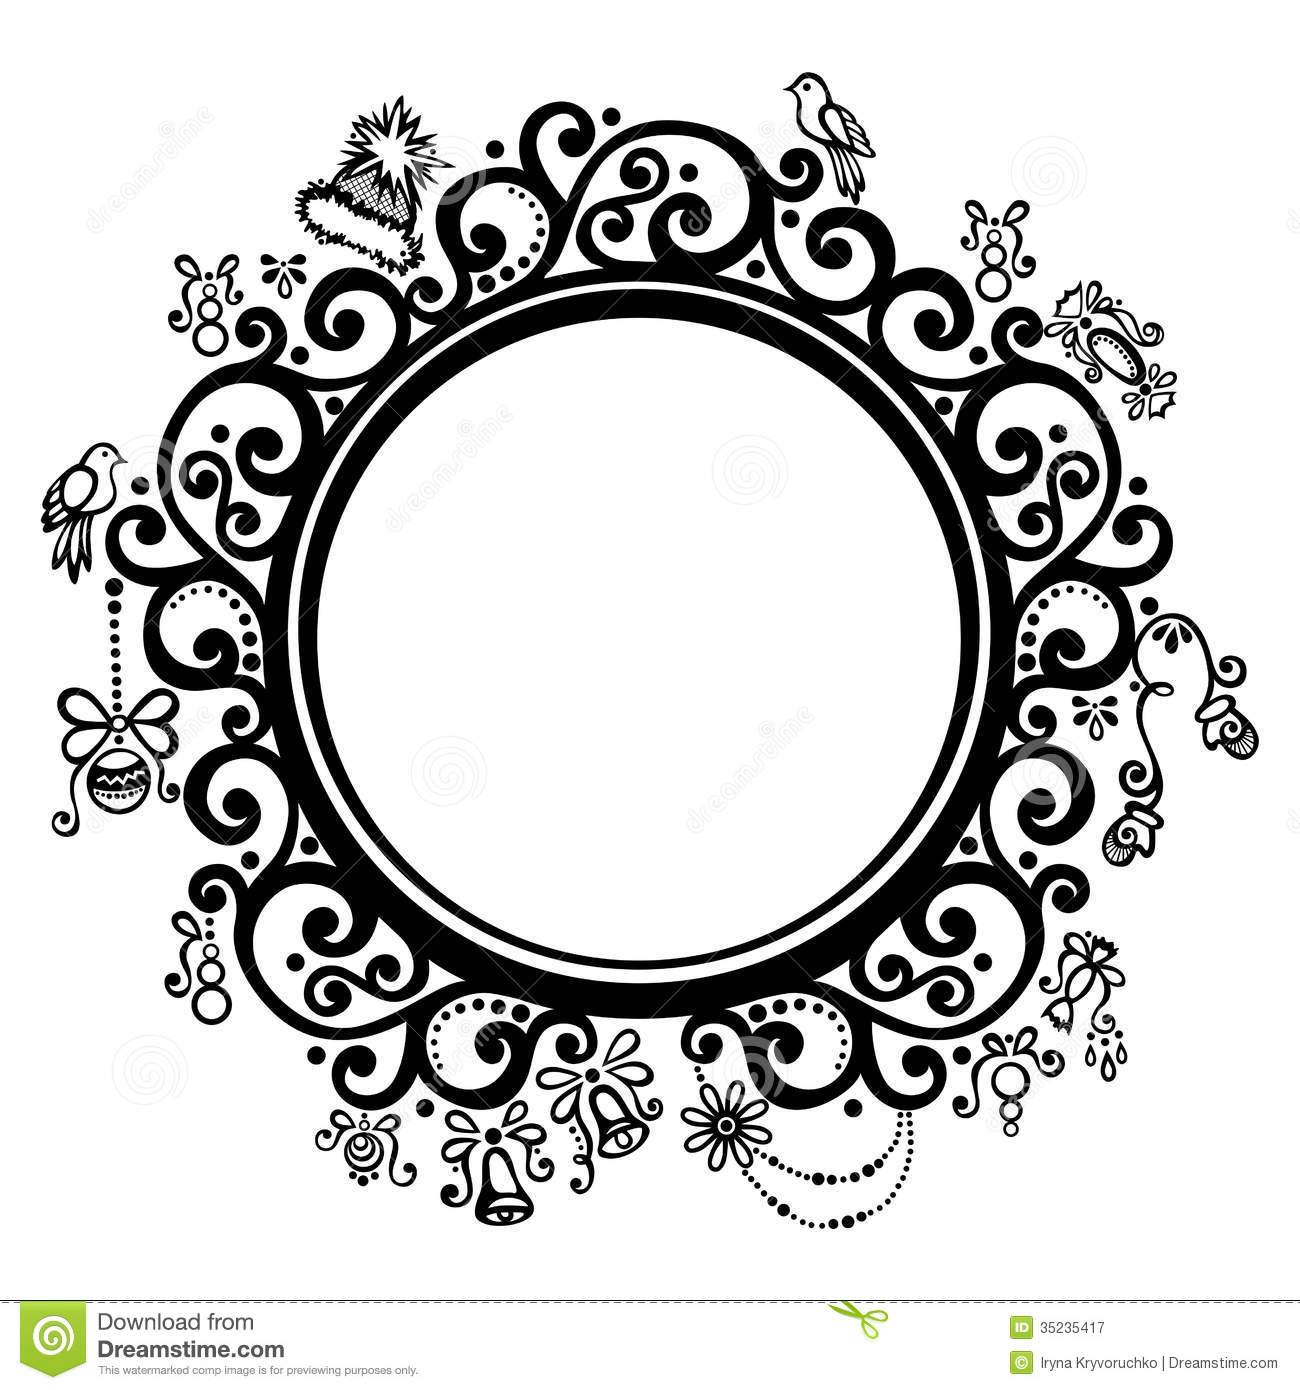 Round Design Clipart.